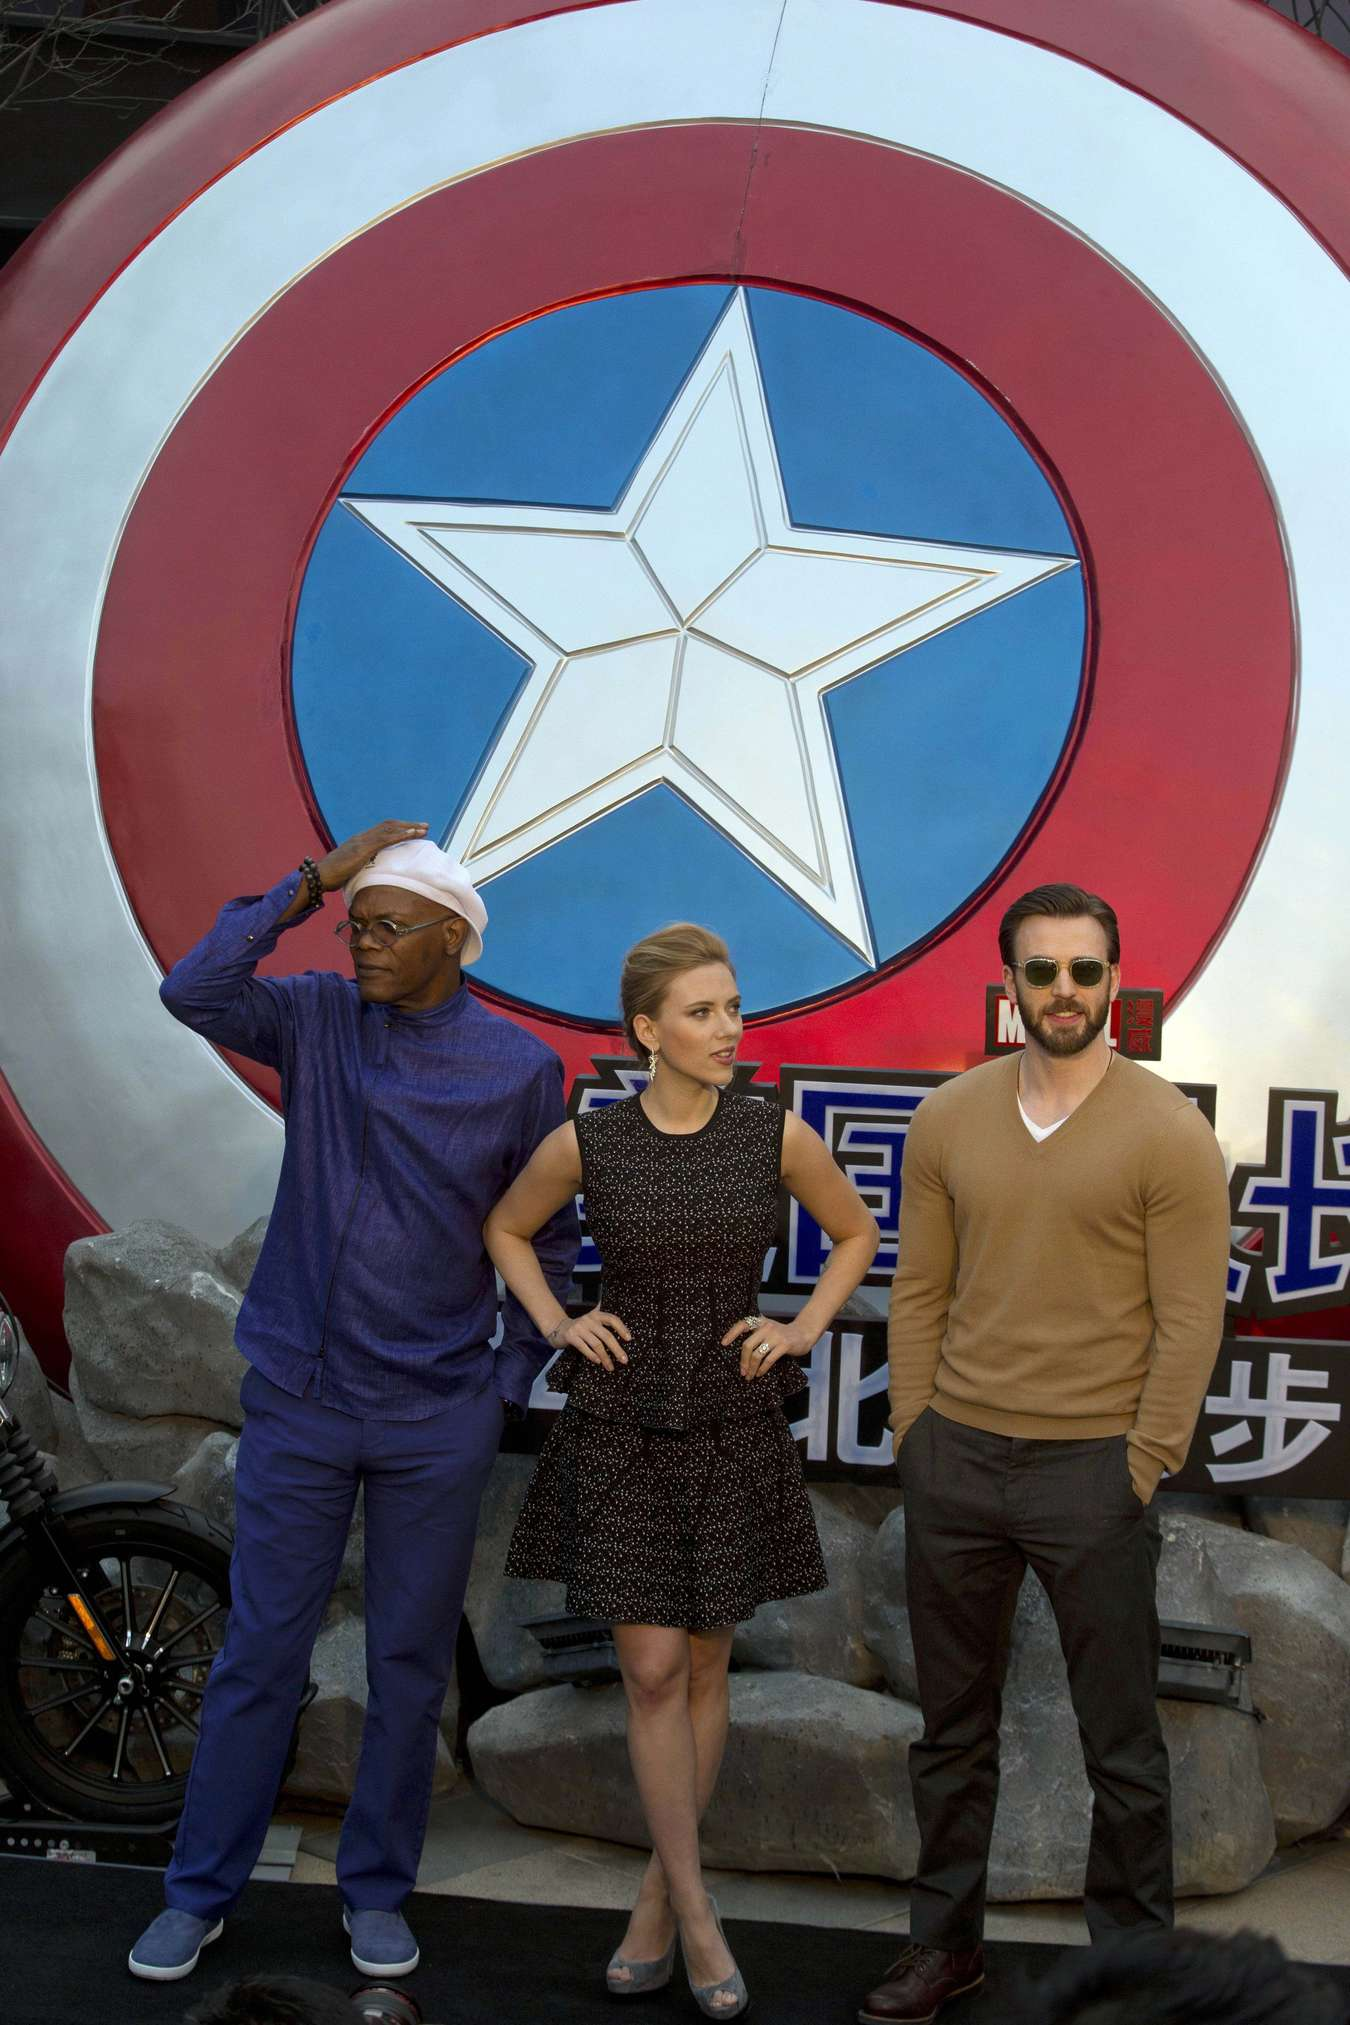 Scarlett Johansson 2014 : Scarlett Johansson: Captain America: The Winter Soldier premiere in Beijing -03